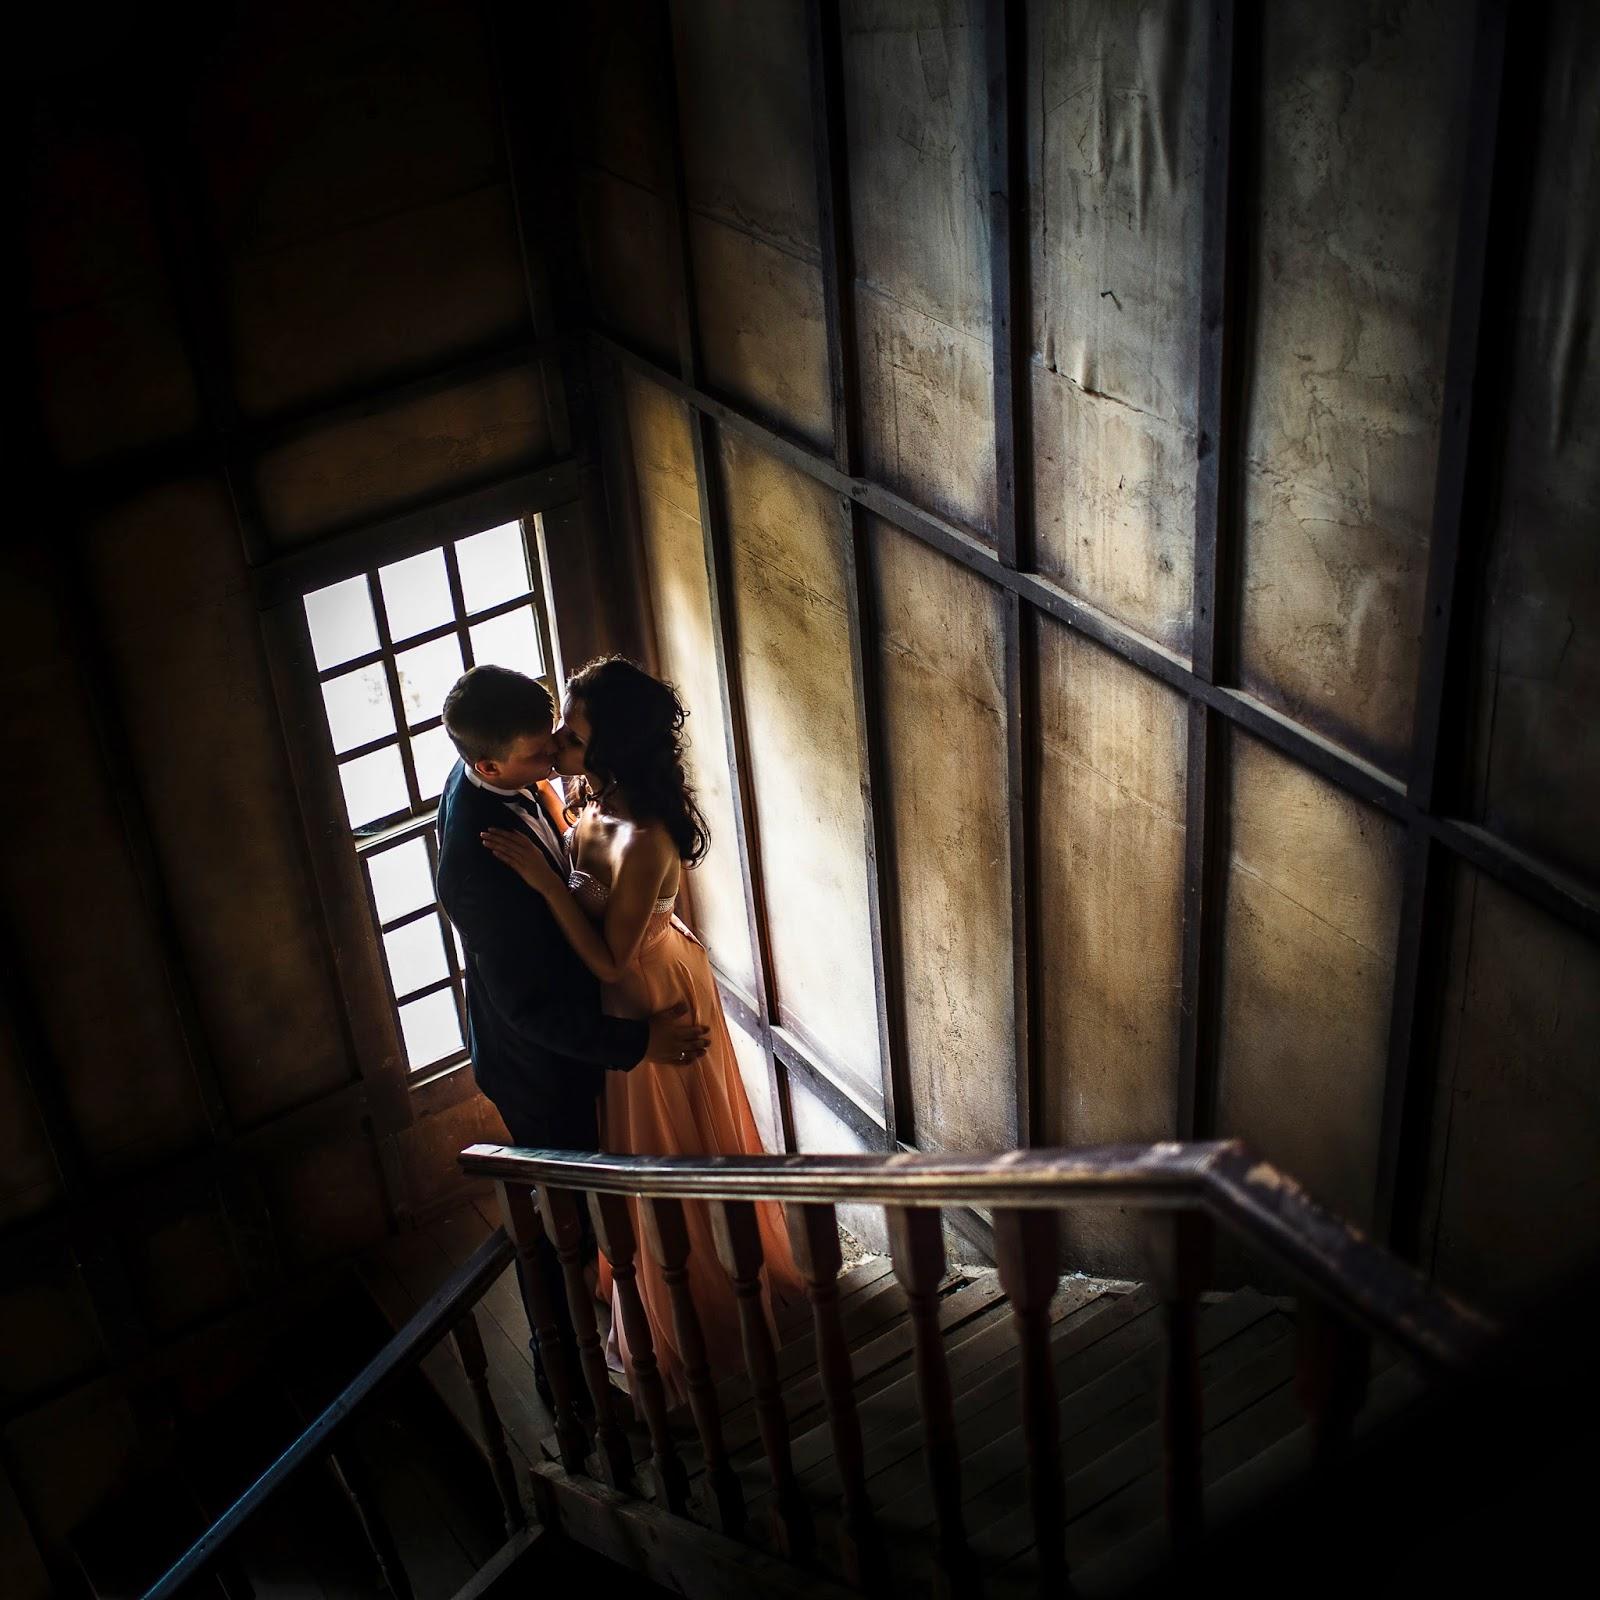 Кристина и Артем. Свадьба в Зеленограде, МО, 2013